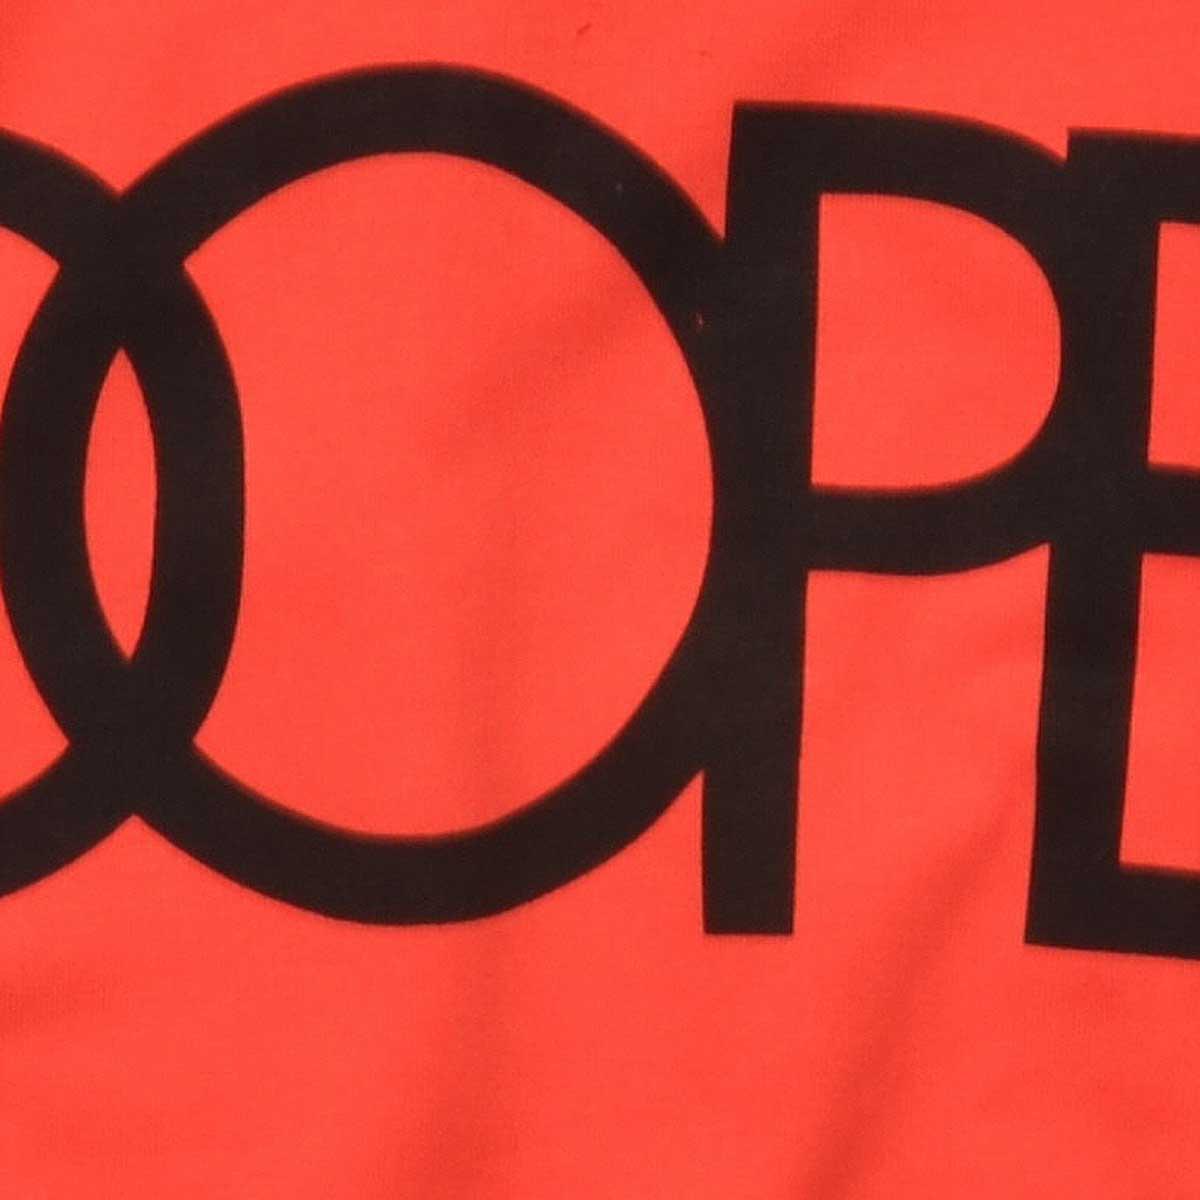 Red Dope Logo Dope logo hoody red 2jpg 1200x1200